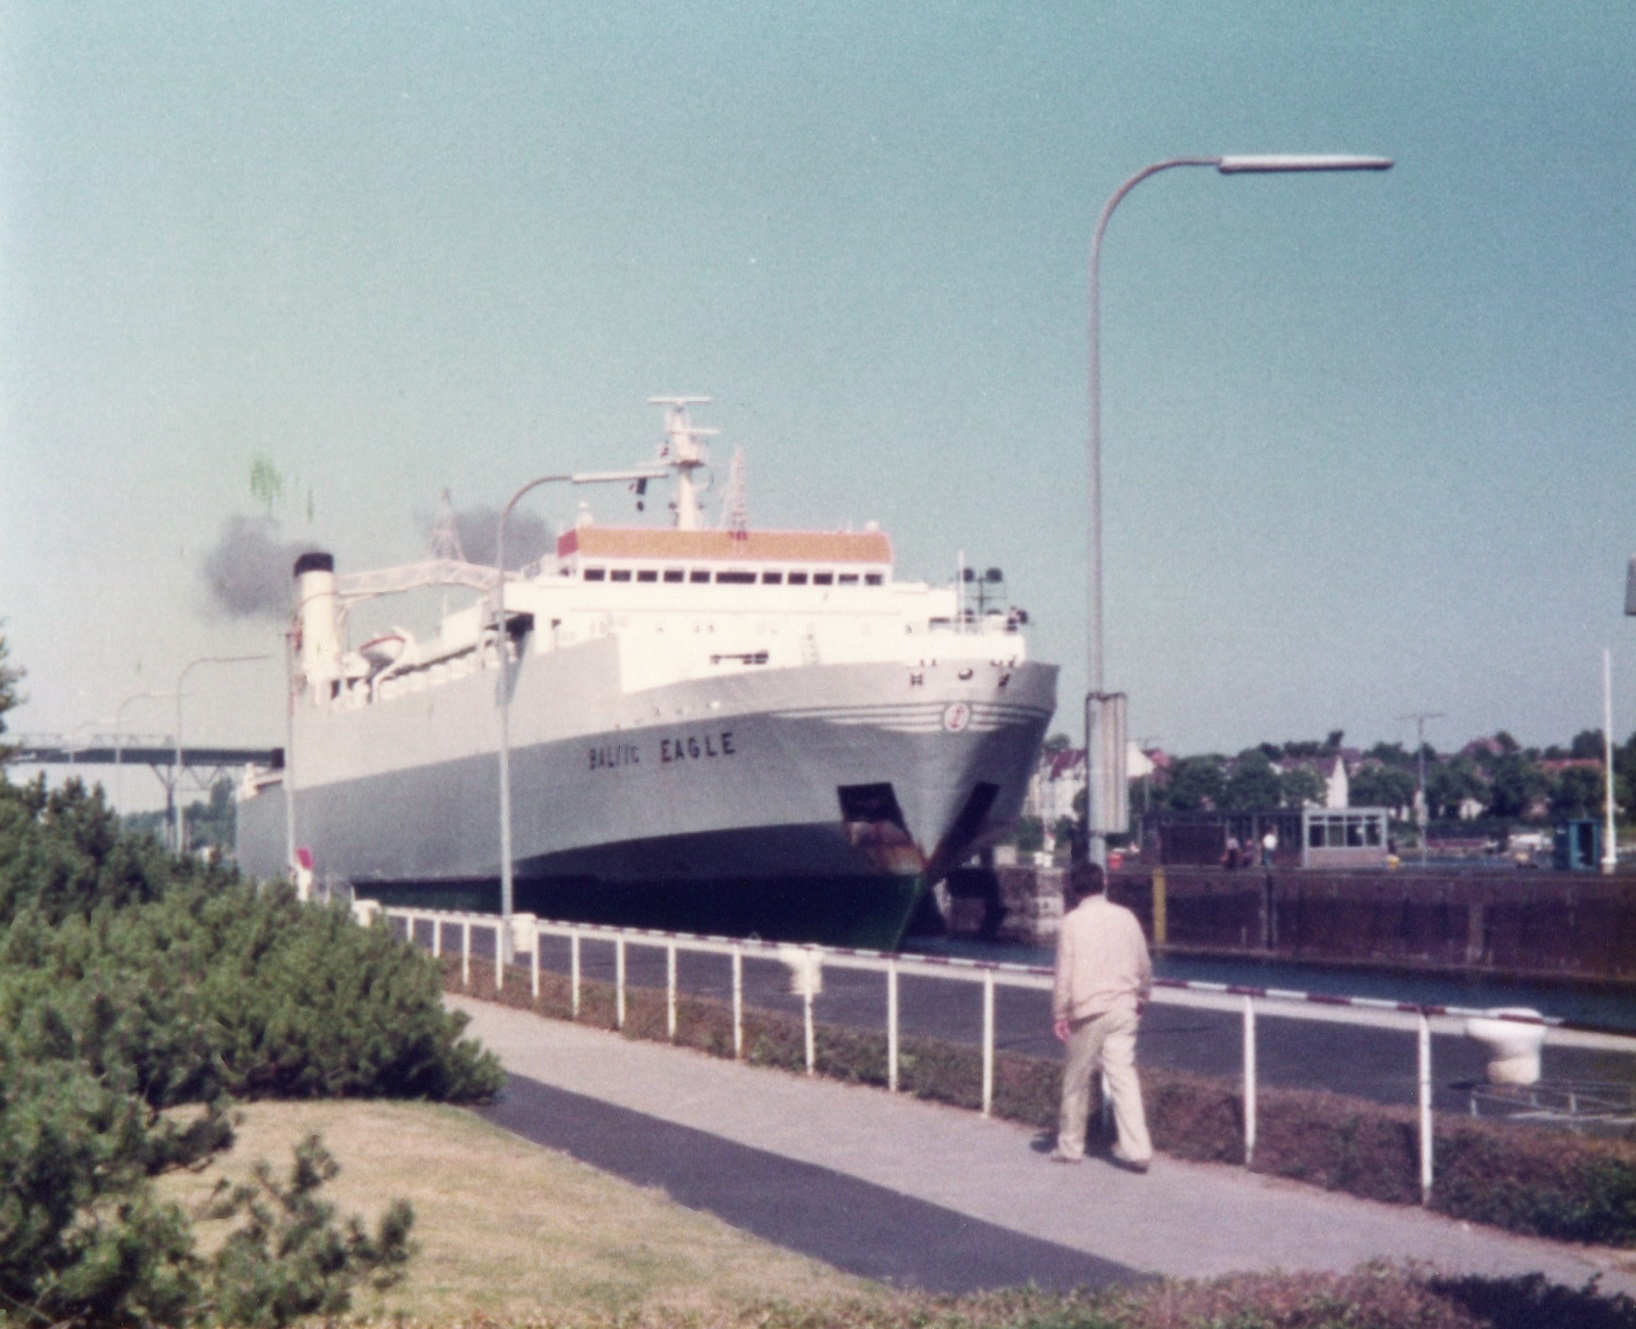 bevoorading-van-de-olympic-paerl-aan-het-oostzee-kanaal-in-kiel